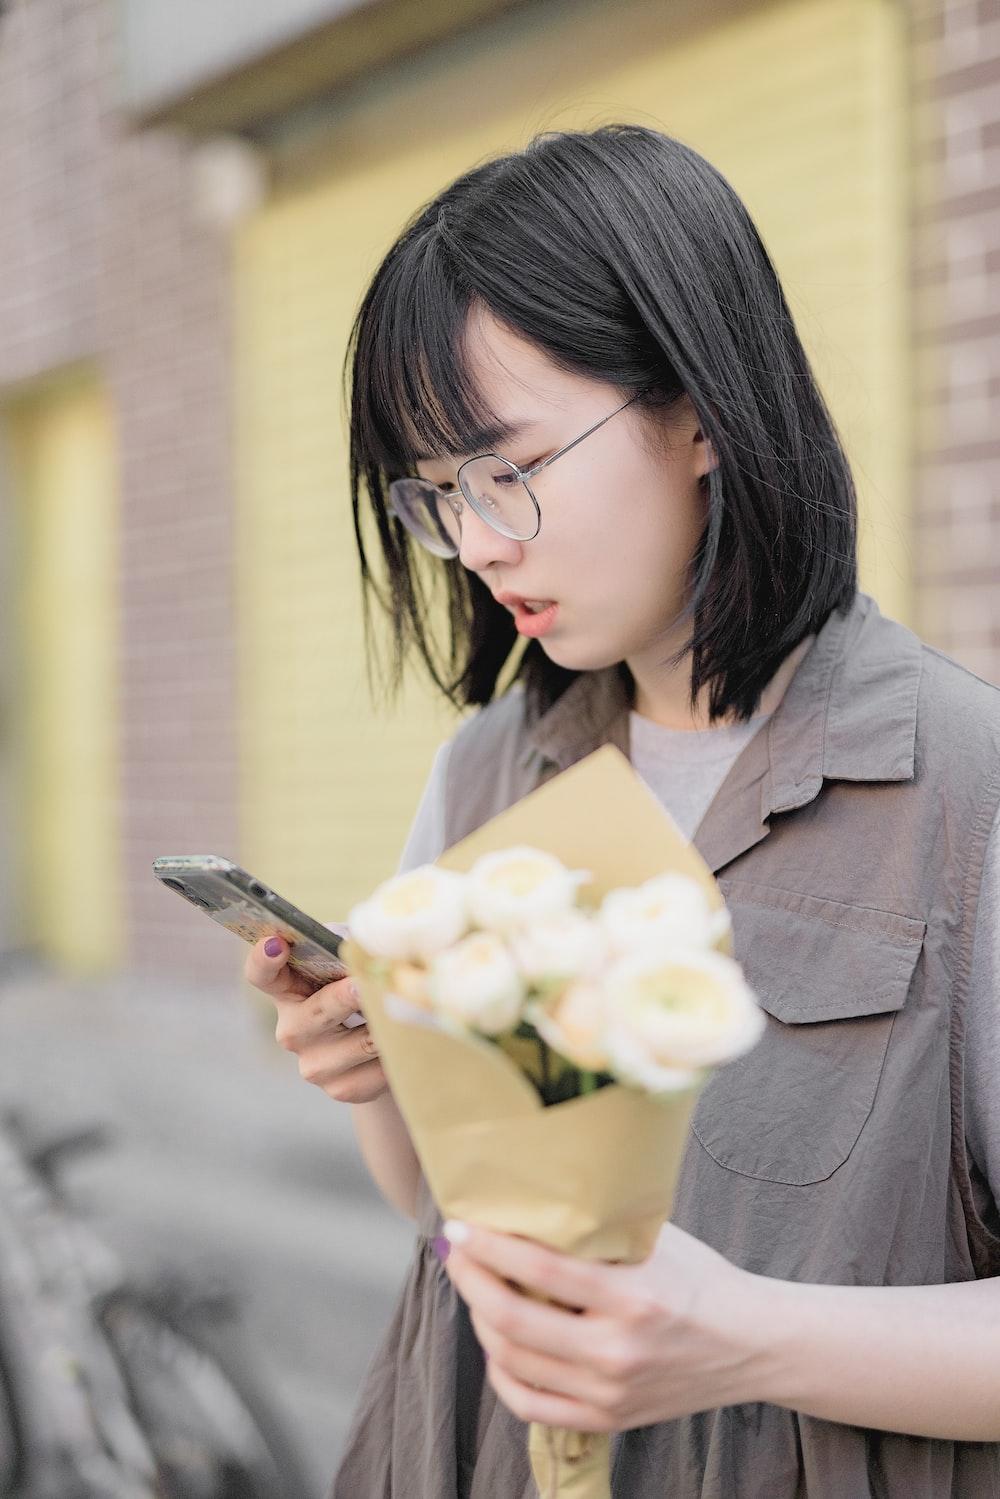 woman in gray blazer holding smartphone